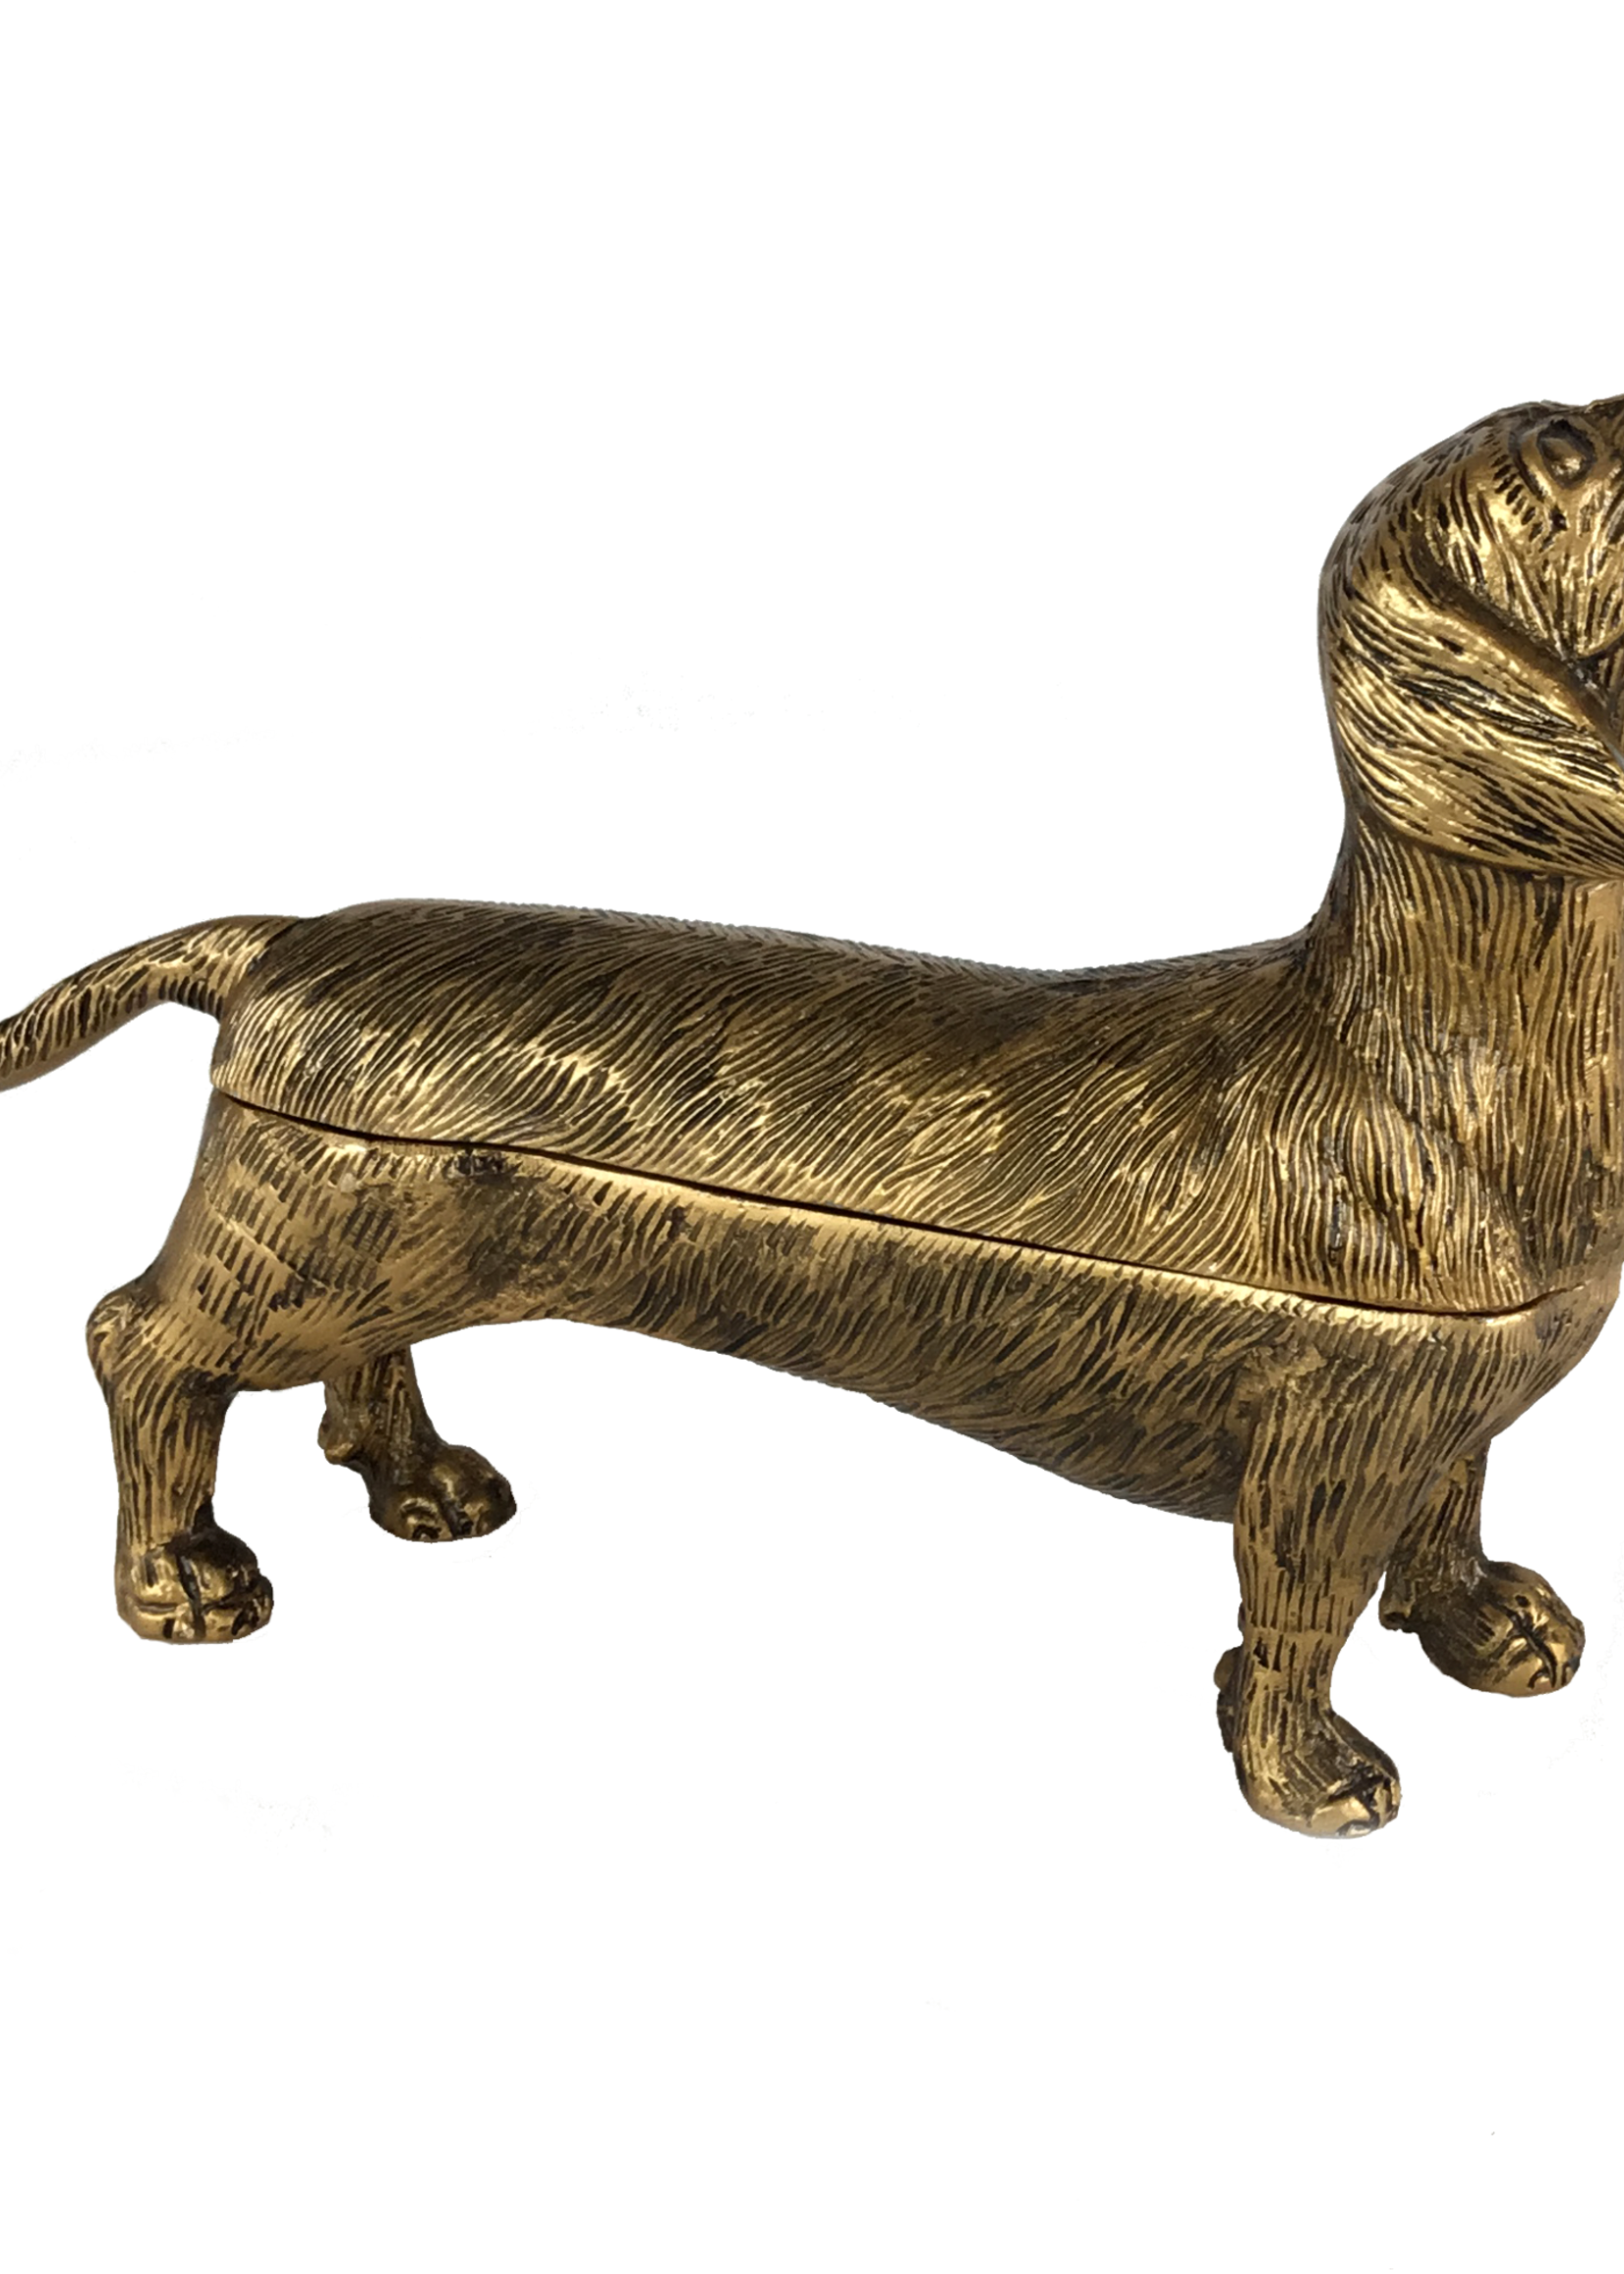 Metal Dog Box in Antique Brass Finish